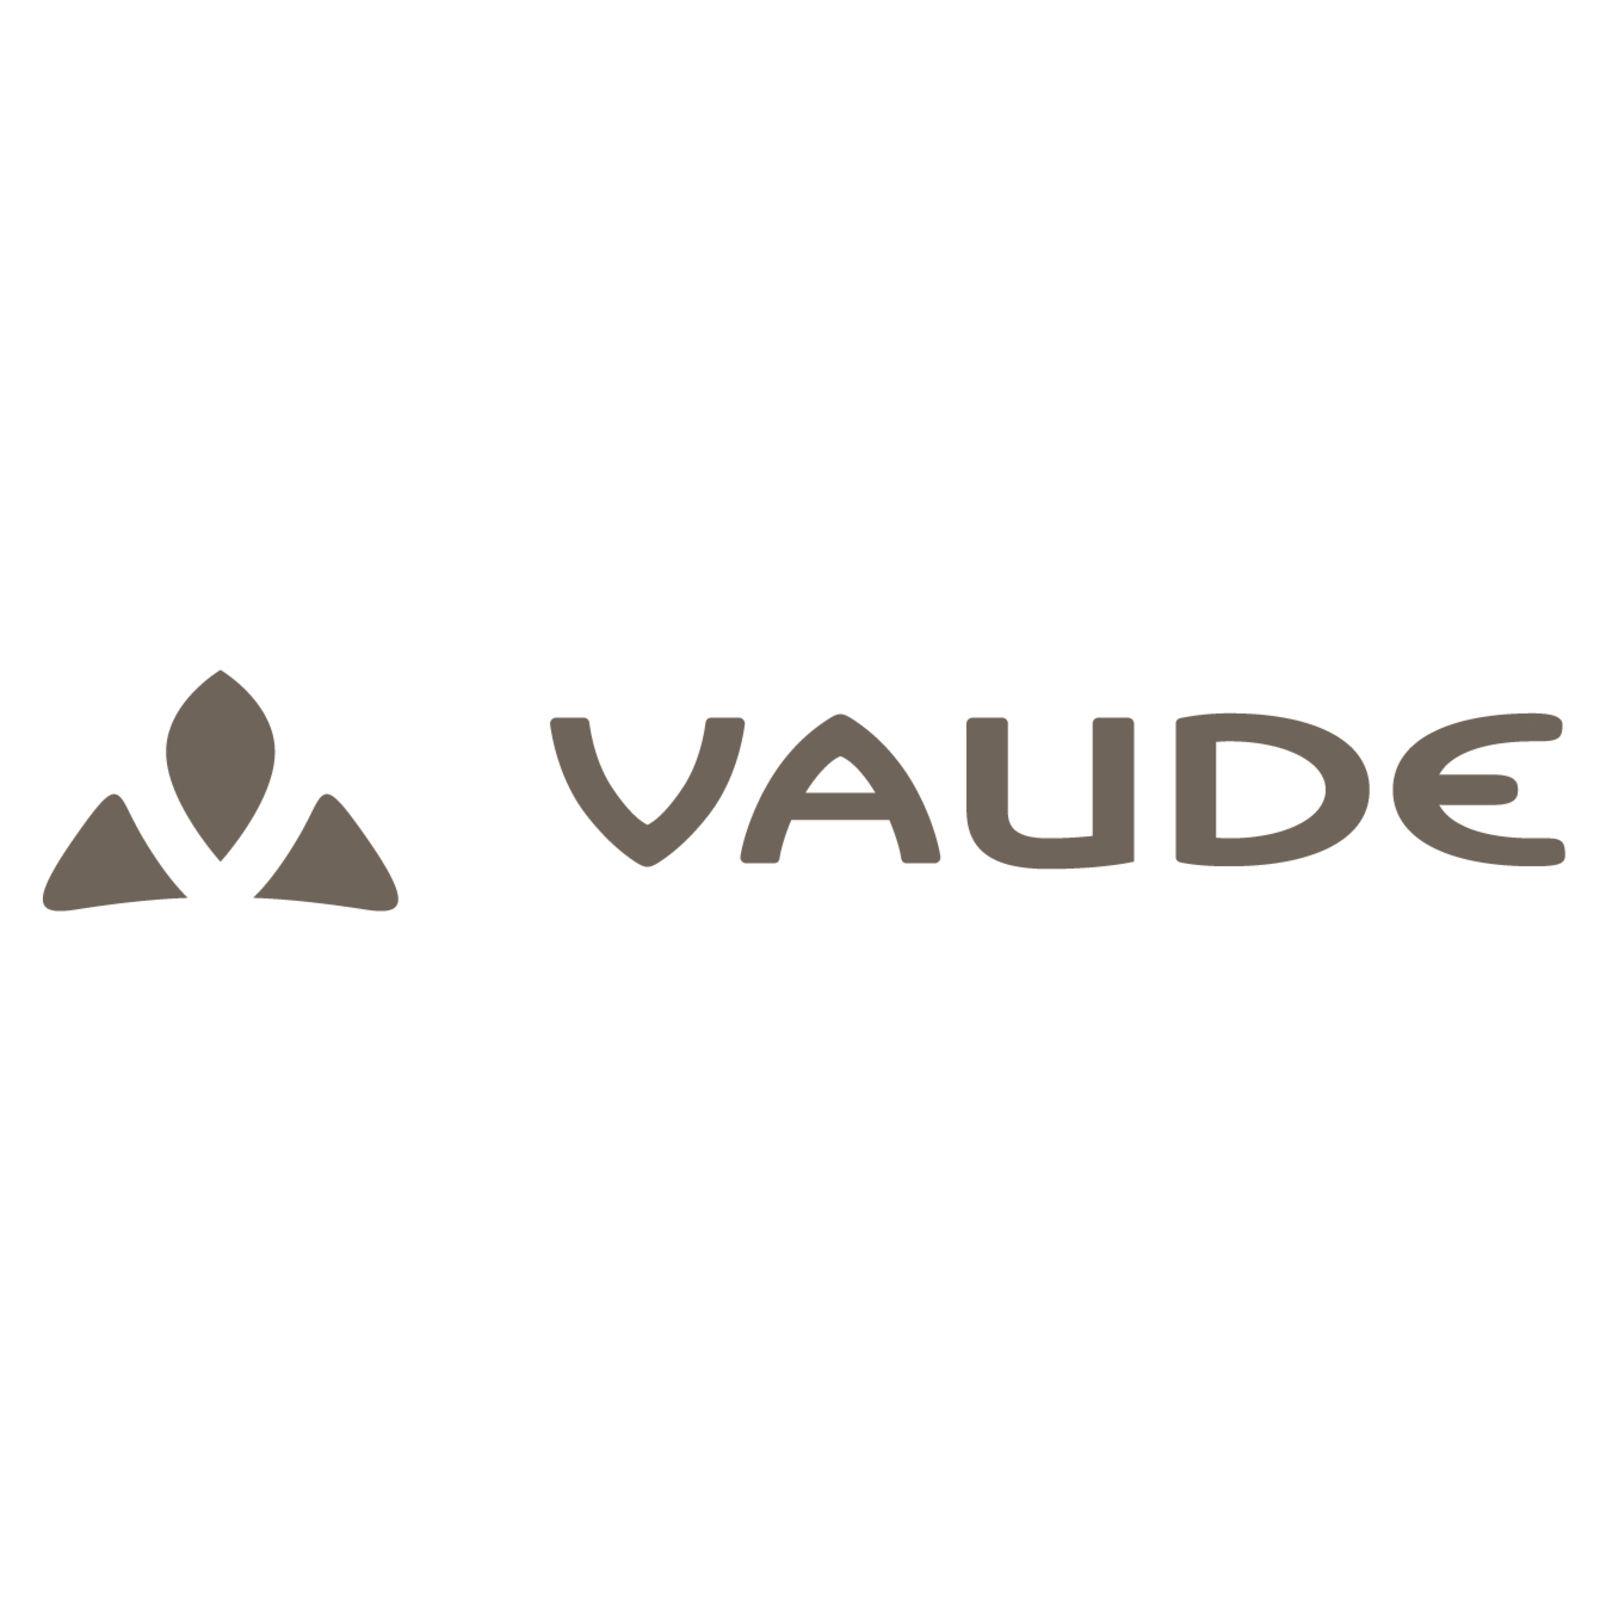 VAUDE (Bild 1)